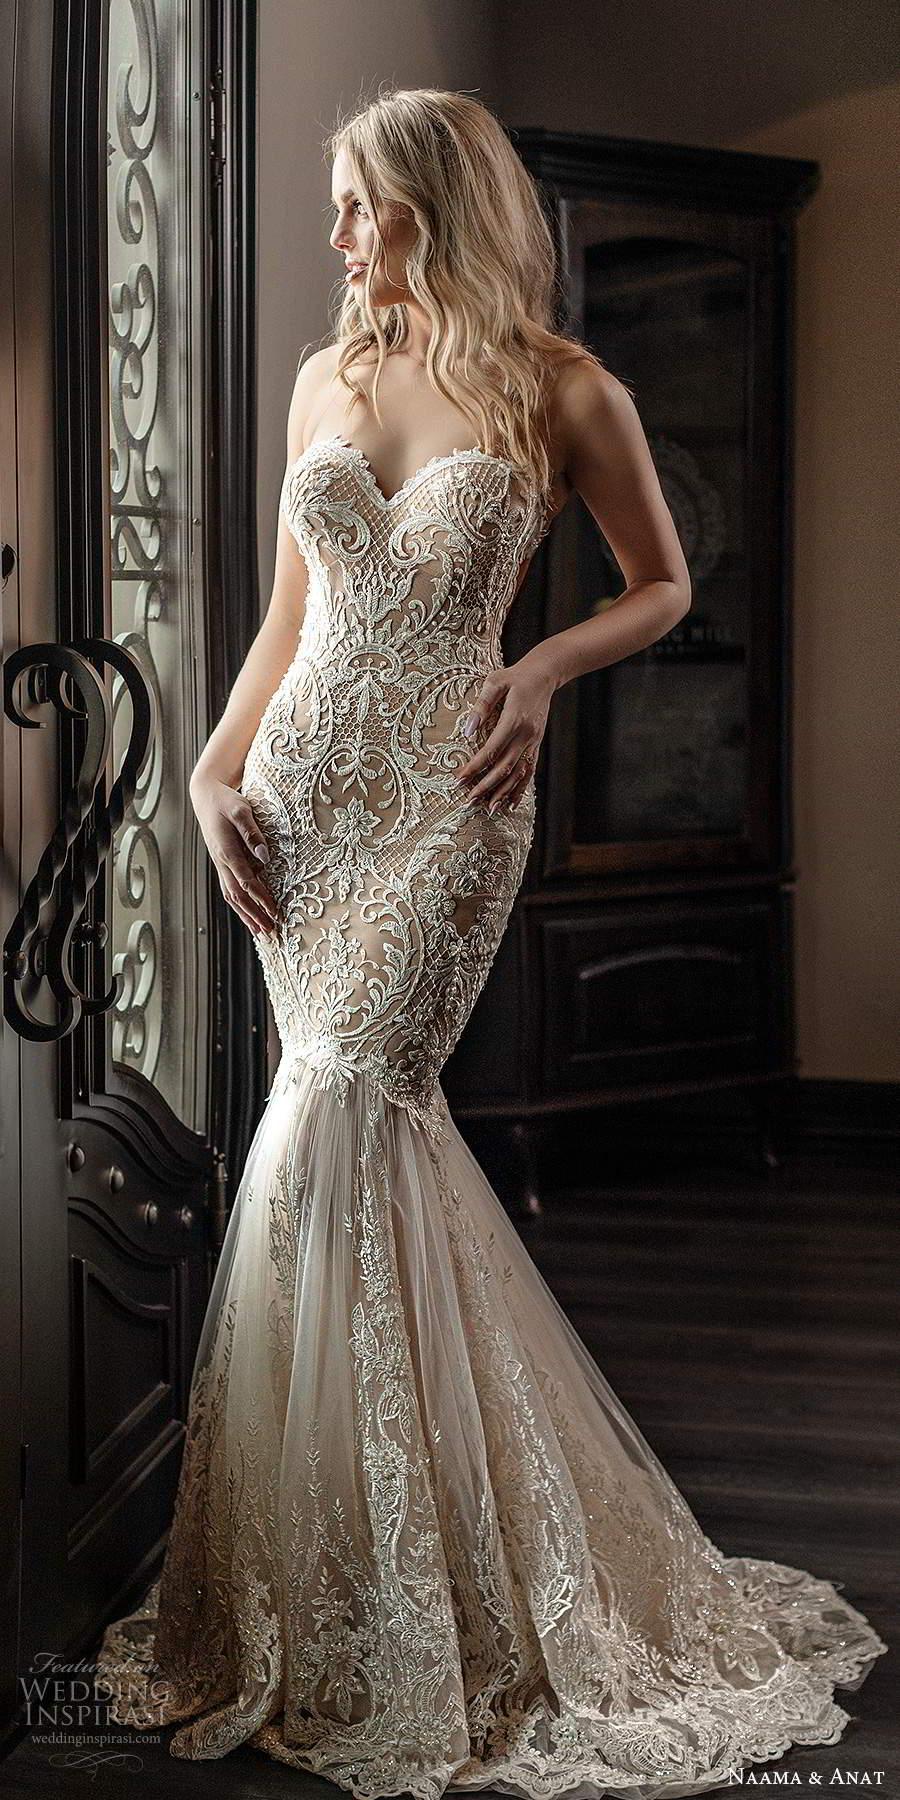 naama anat spring 2020 knottinghill bridal strapless sweetheart neckline fully embellished lace fit flare mermaid elegant wedding dress chapel train (1) mv